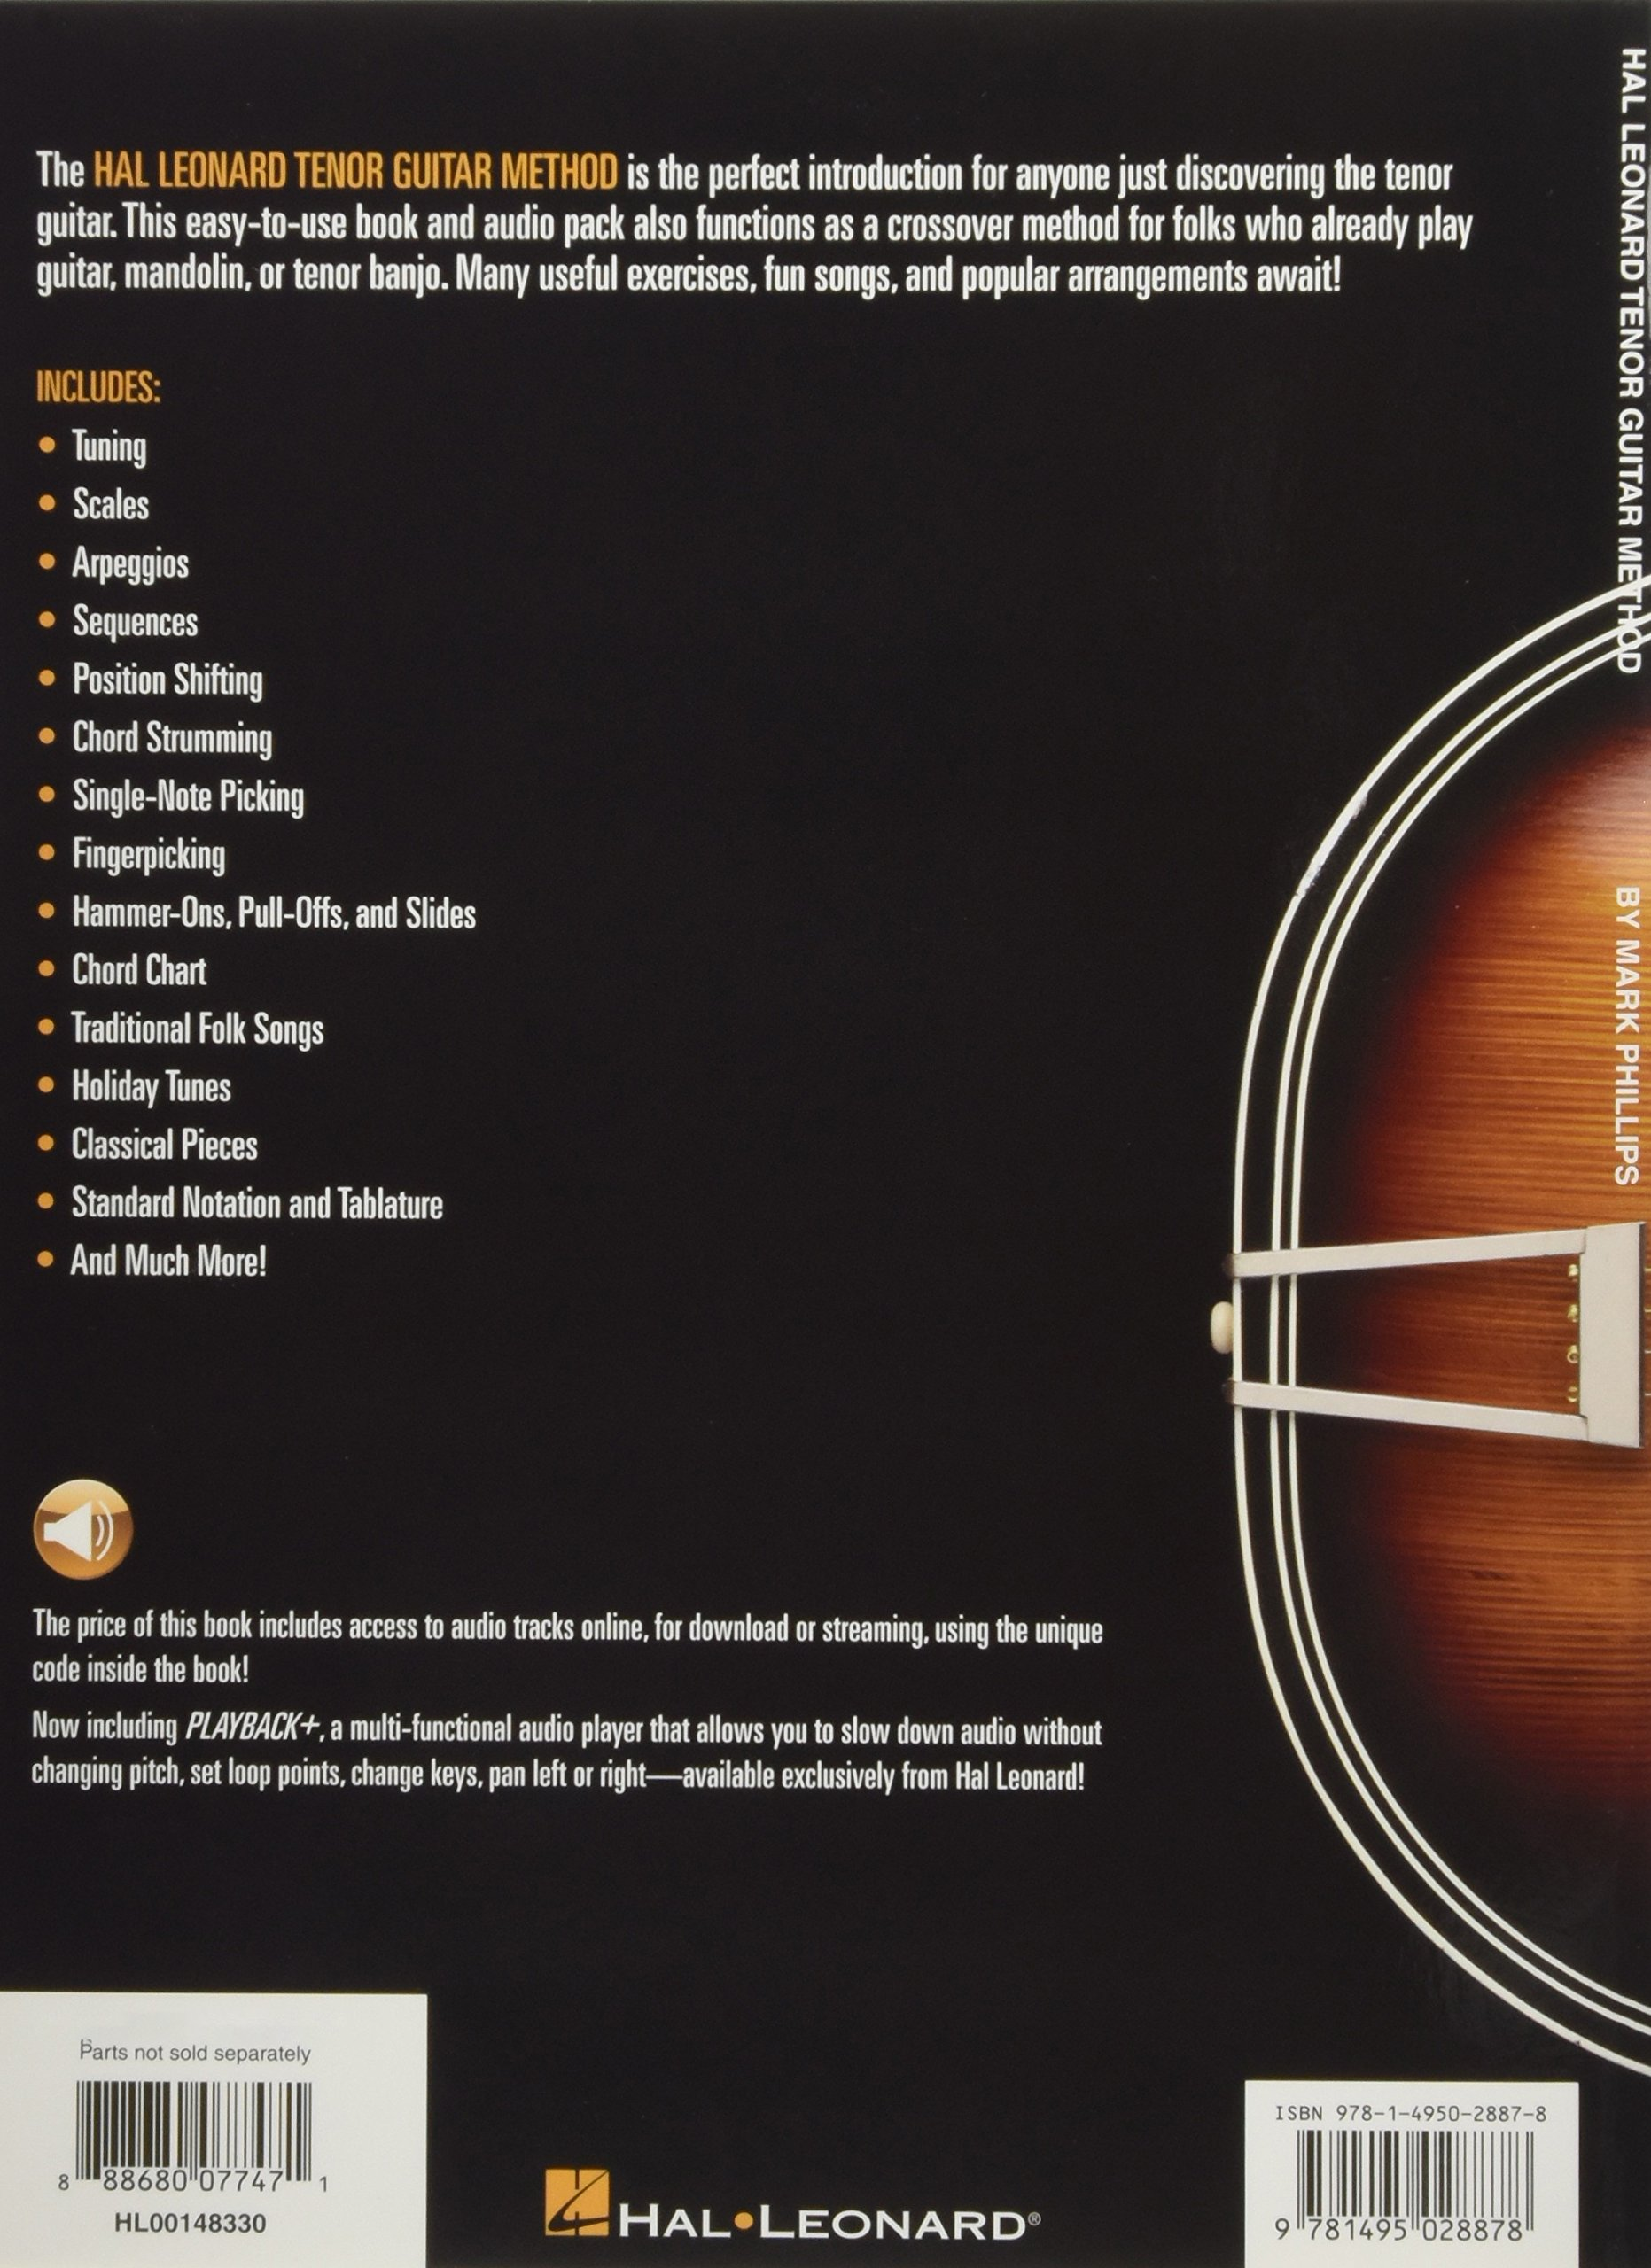 Hal Leonard Tenor Guitar Method Amazon Mark Phillips Dr Books